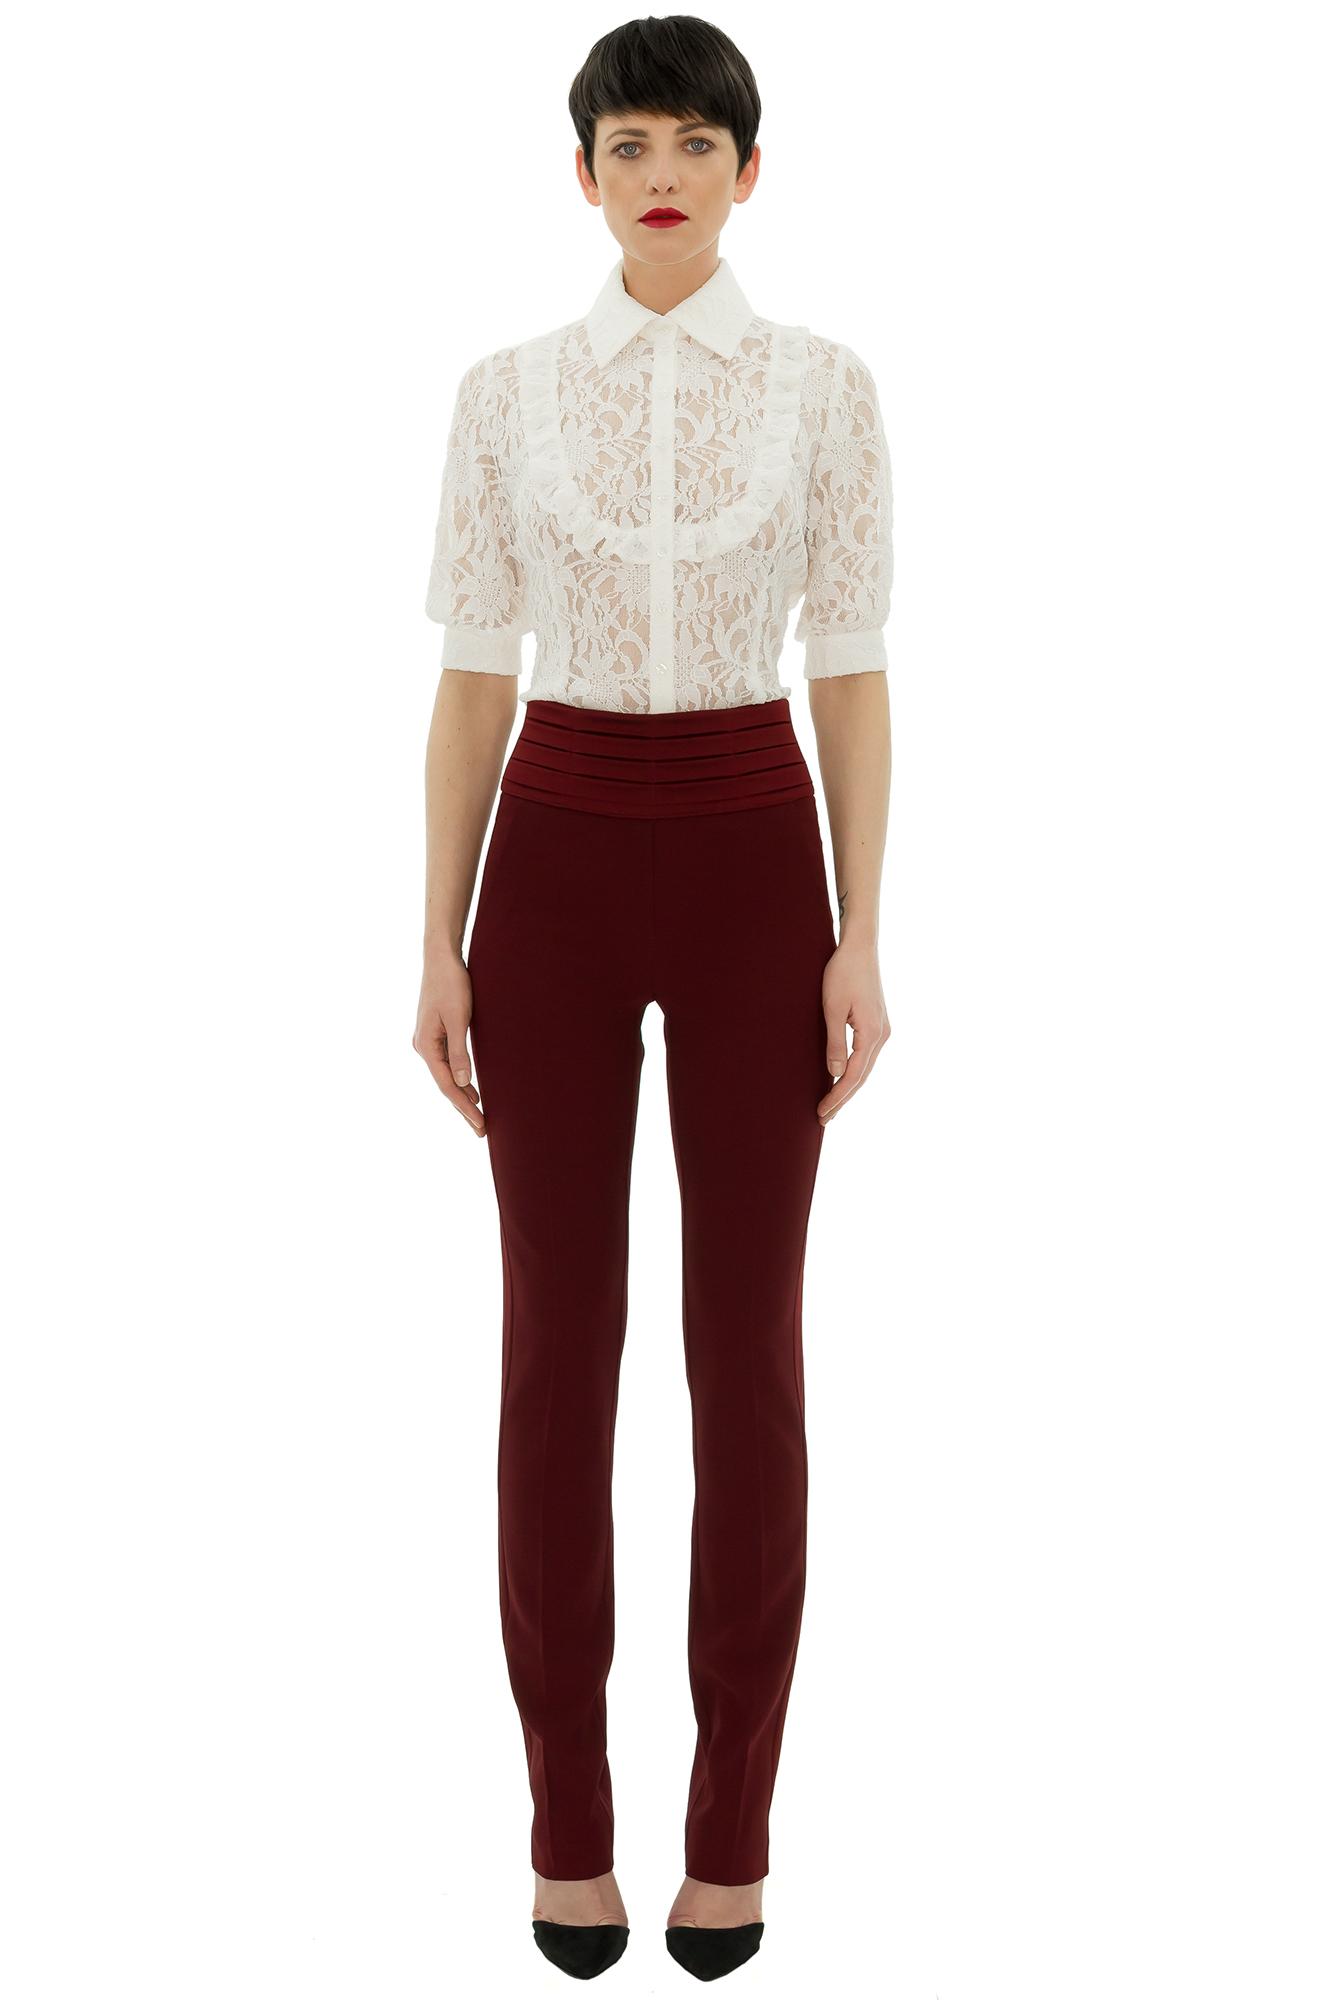 Bien-aimé smoking femme, pantalon taille haute, smoking rouge, Tanya Chubko  VO02